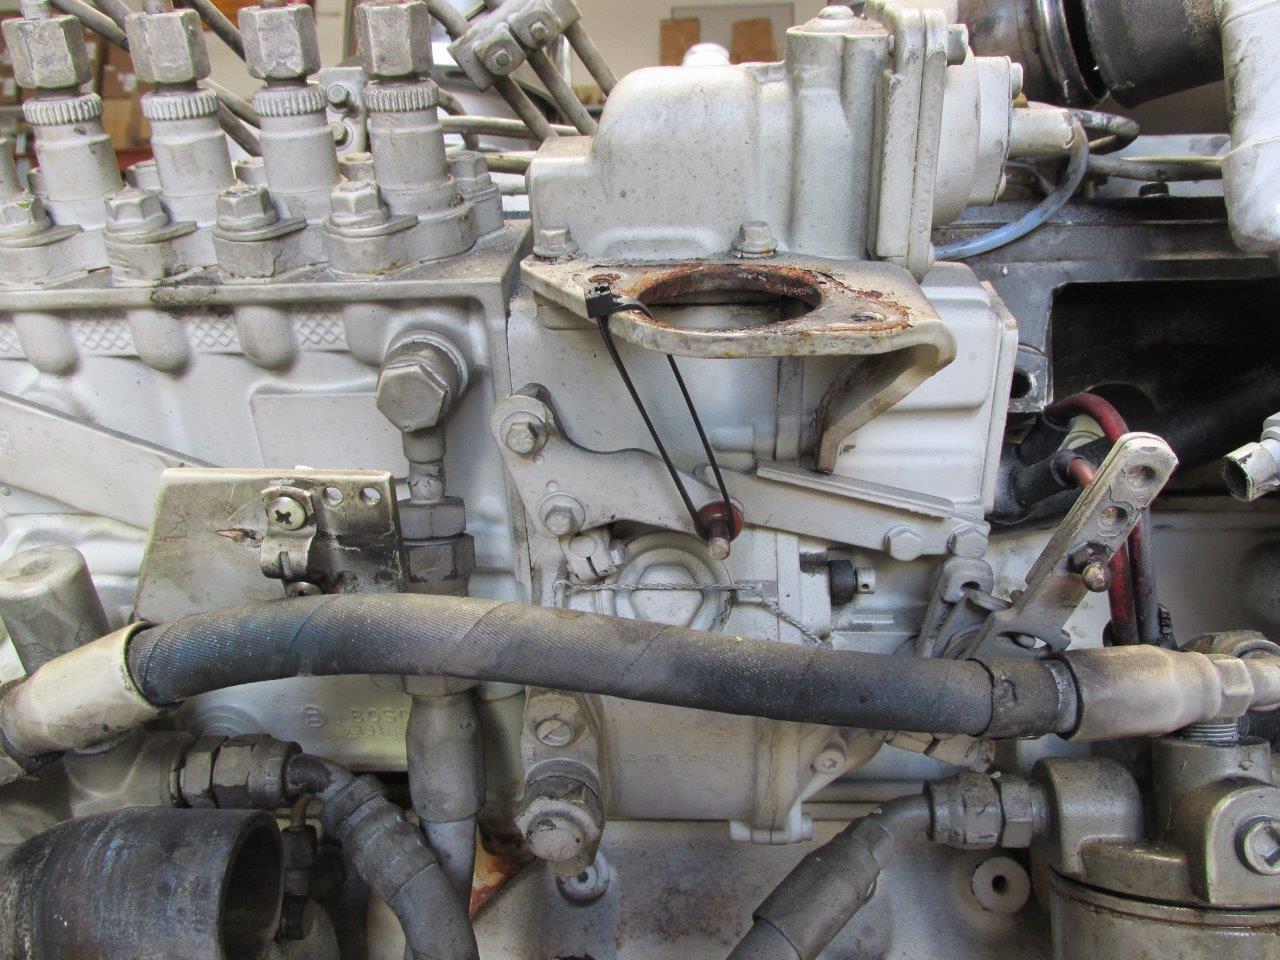 ga-z97-hd3 how to turn off turbo boost